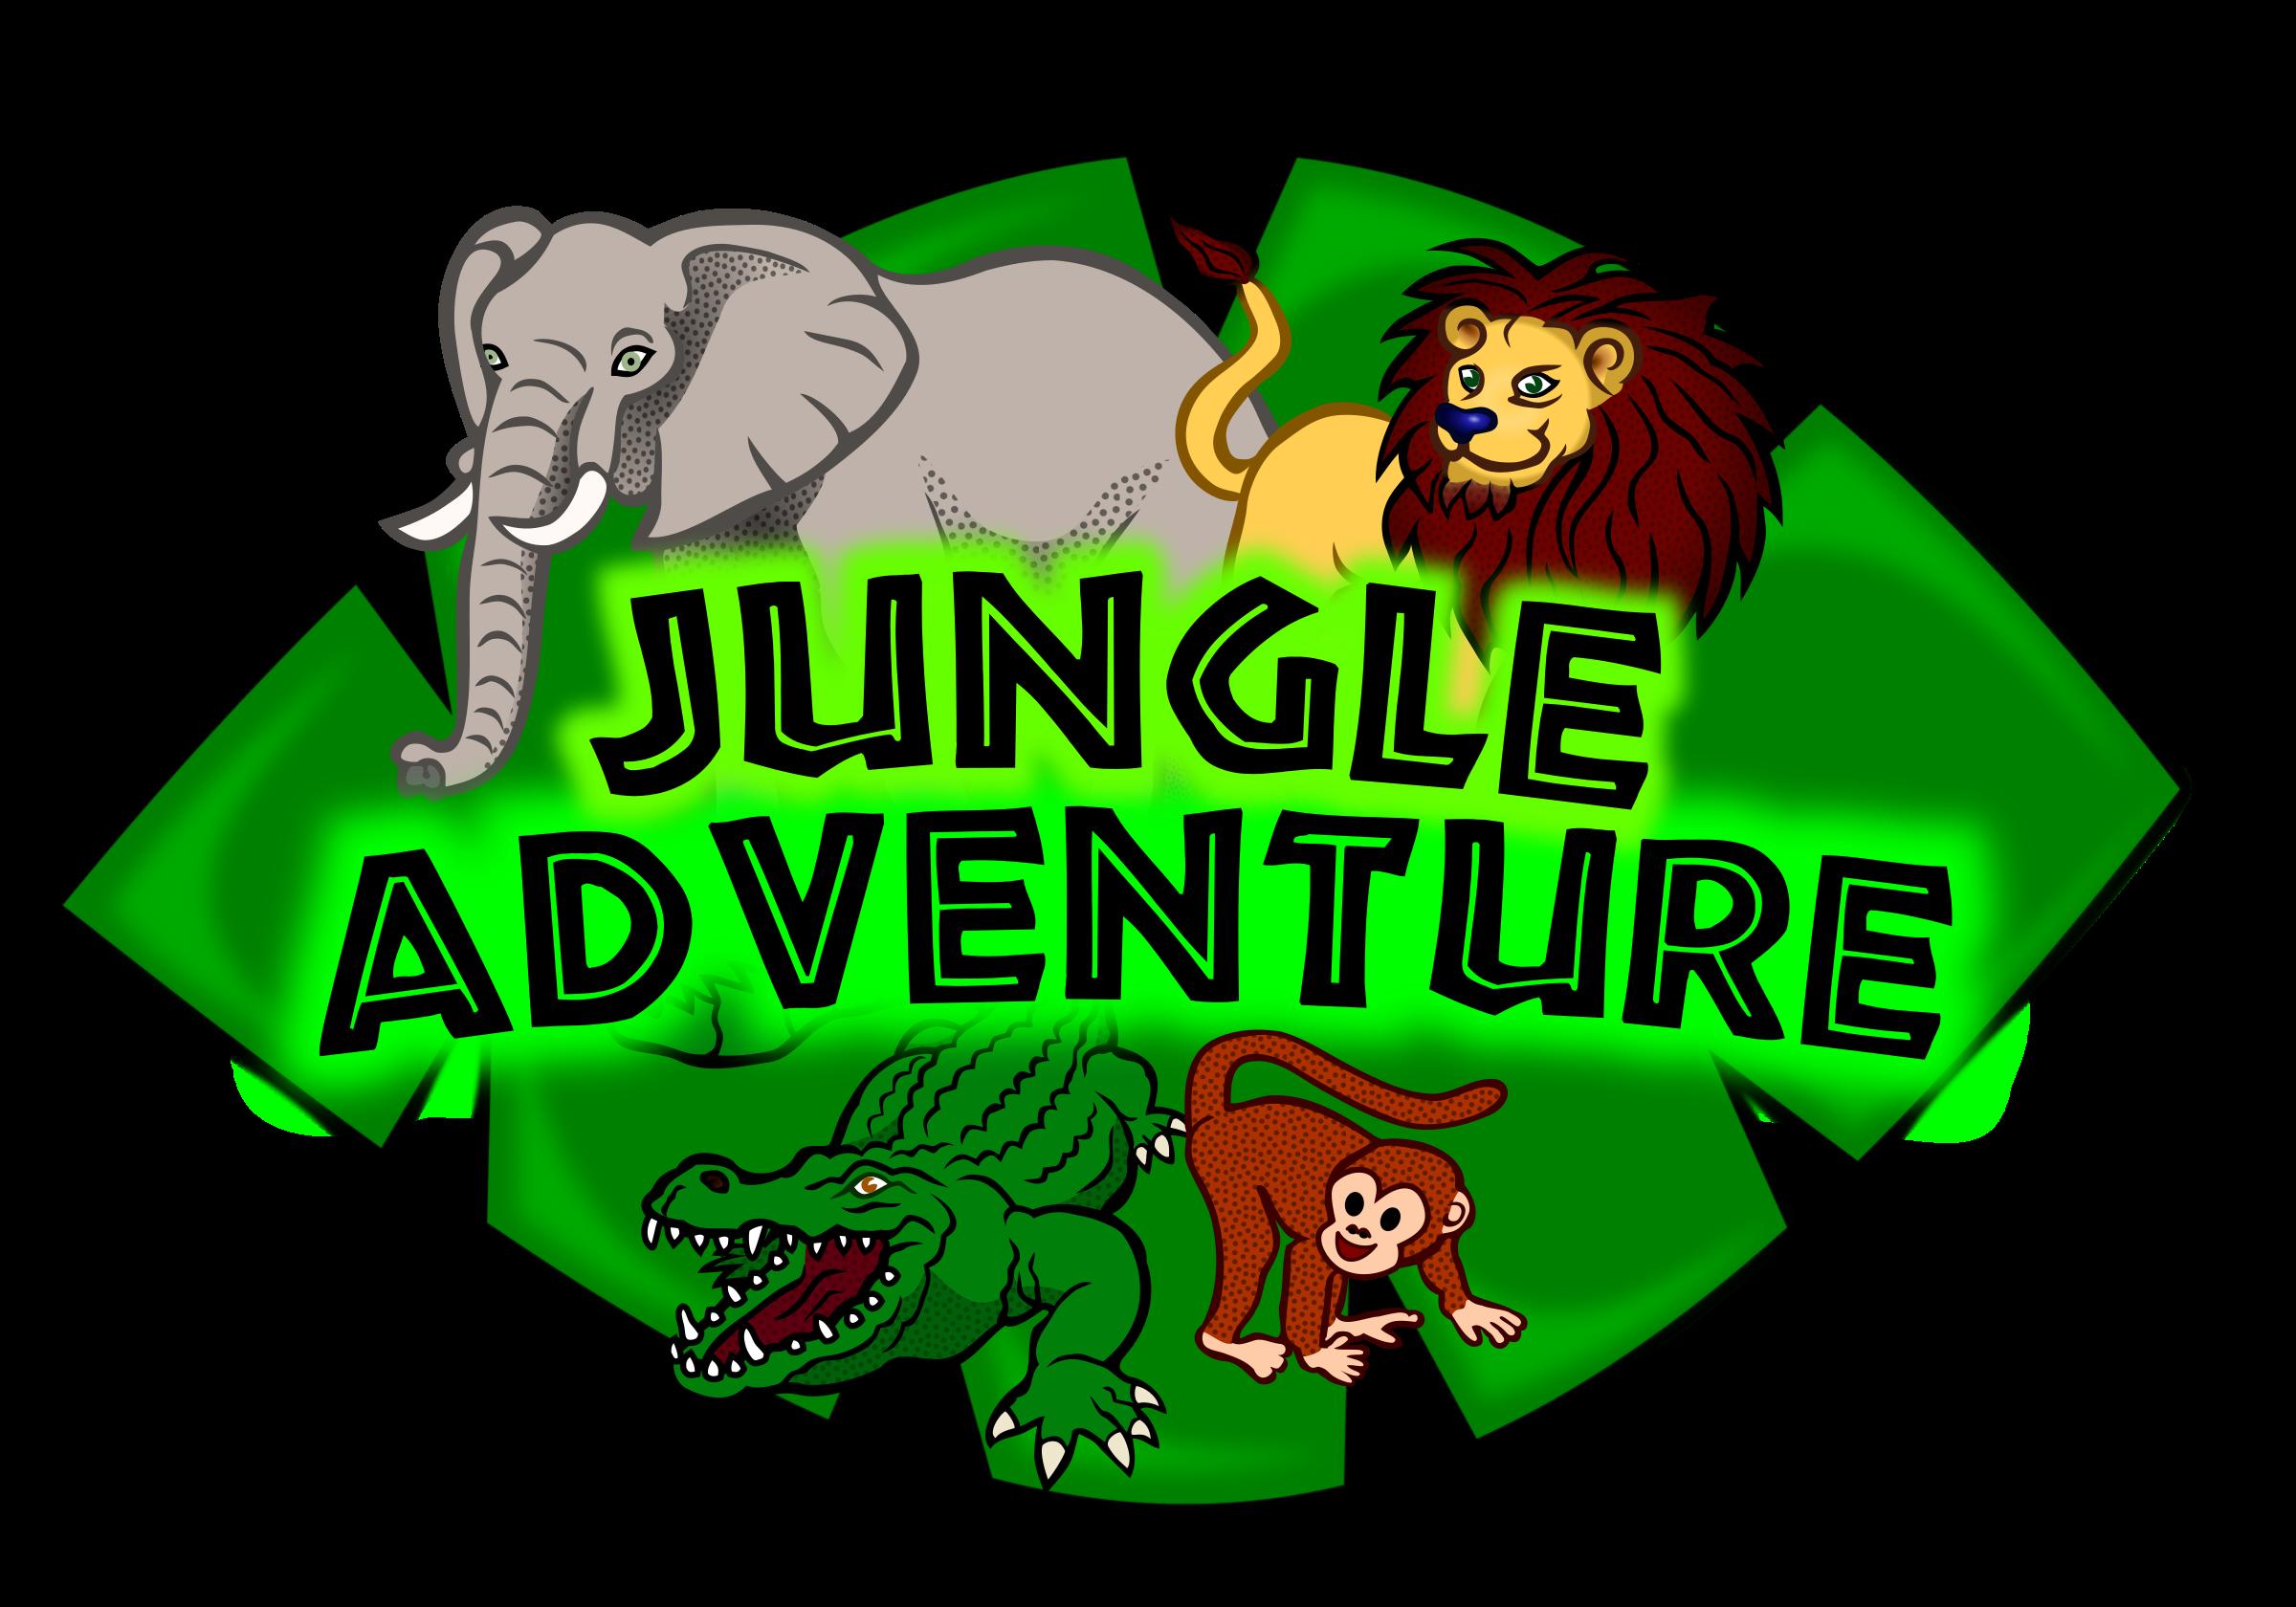 Jungle clipart crocodile. Adventure kids club logo